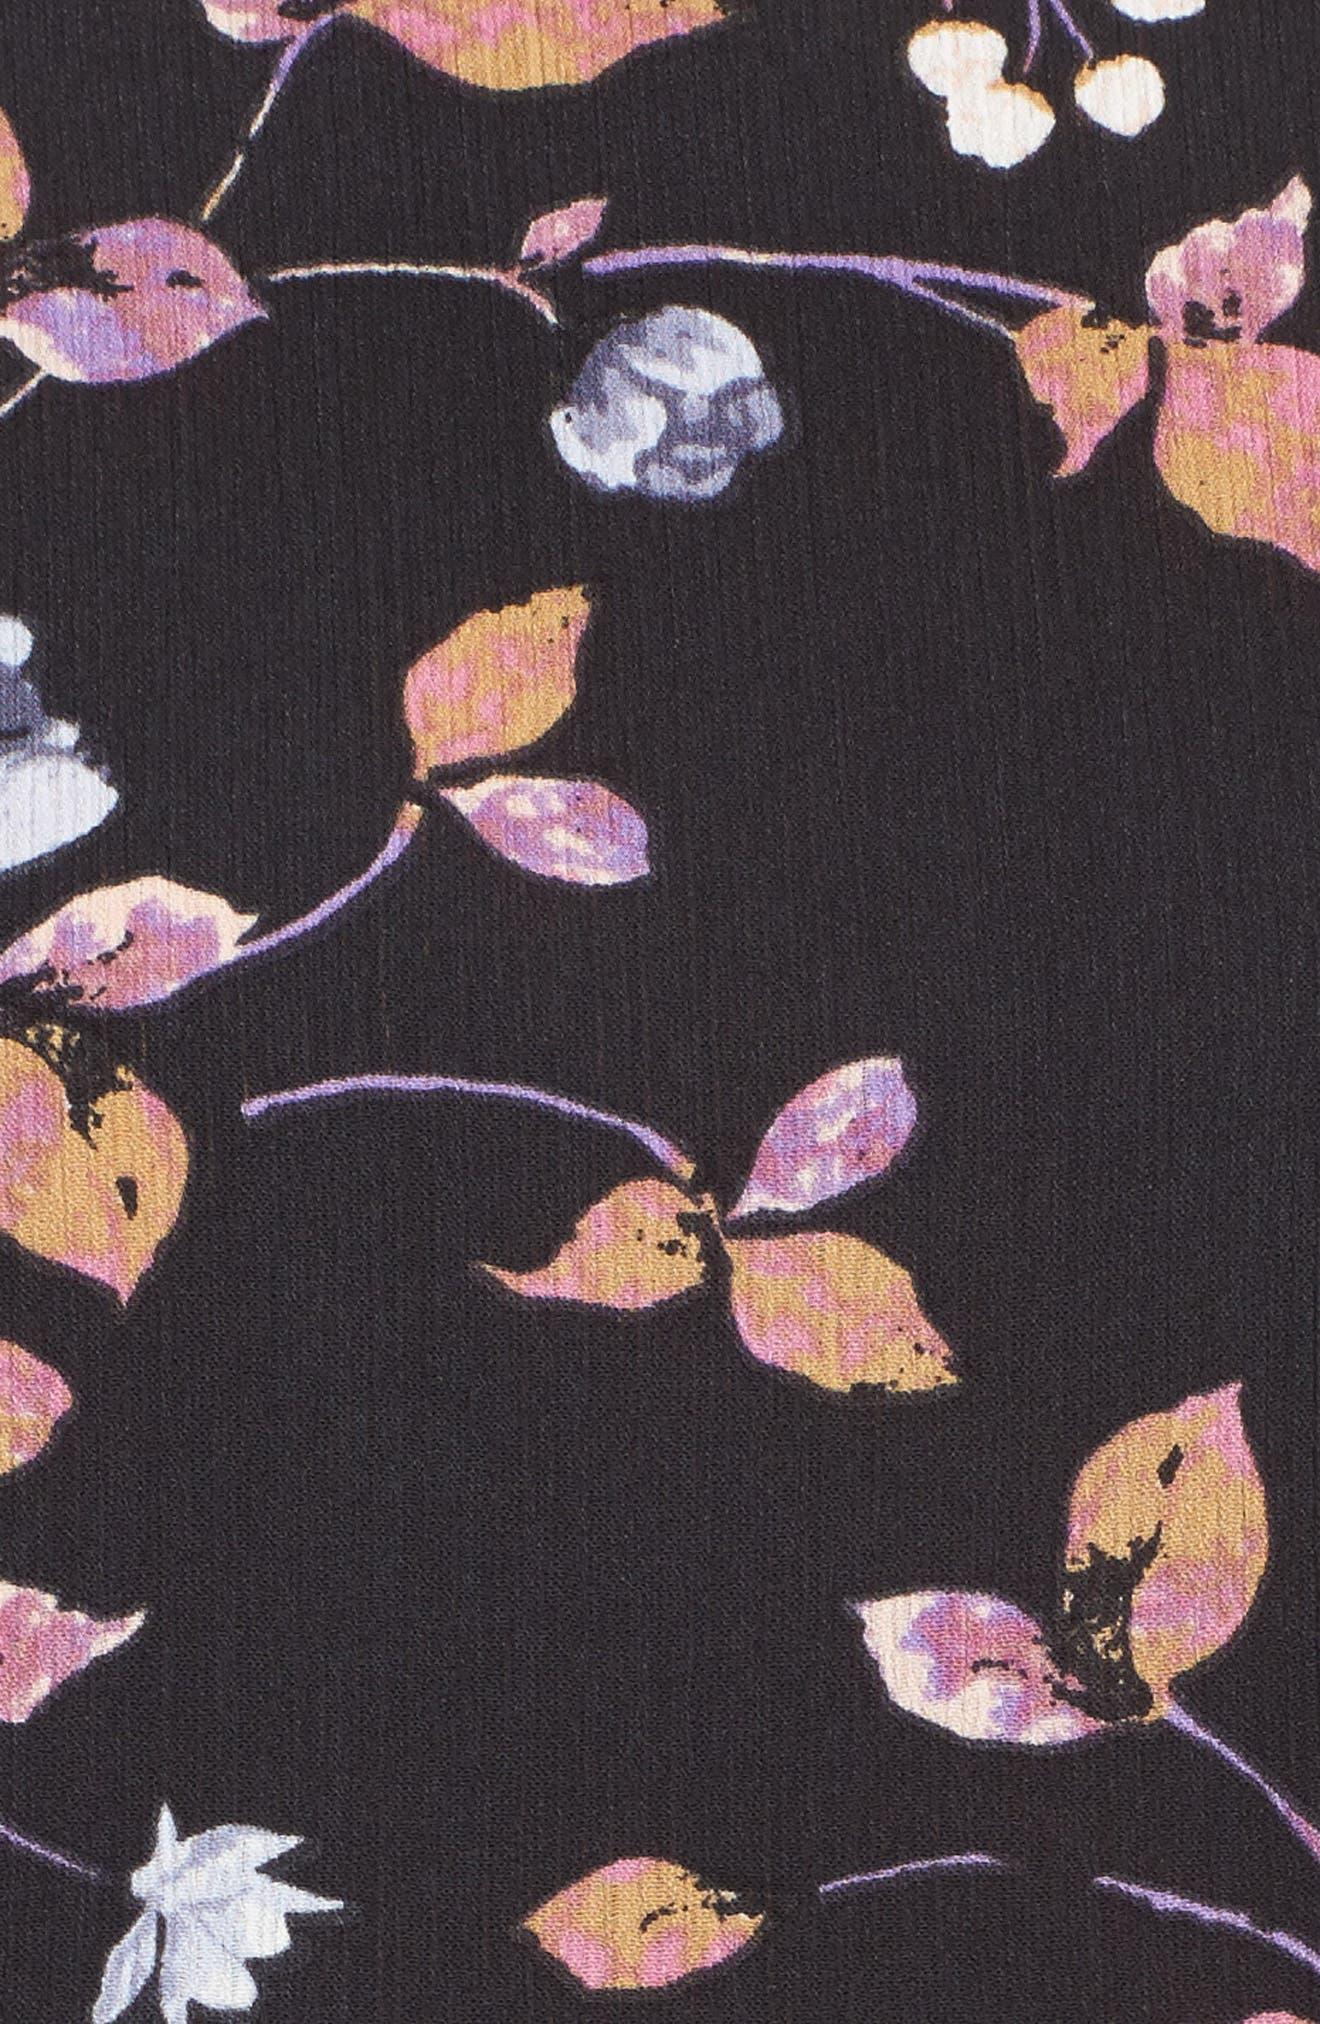 Tiered Ruffle Sleeve Peplum Blouse,                             Alternate thumbnail 5, color,                             003